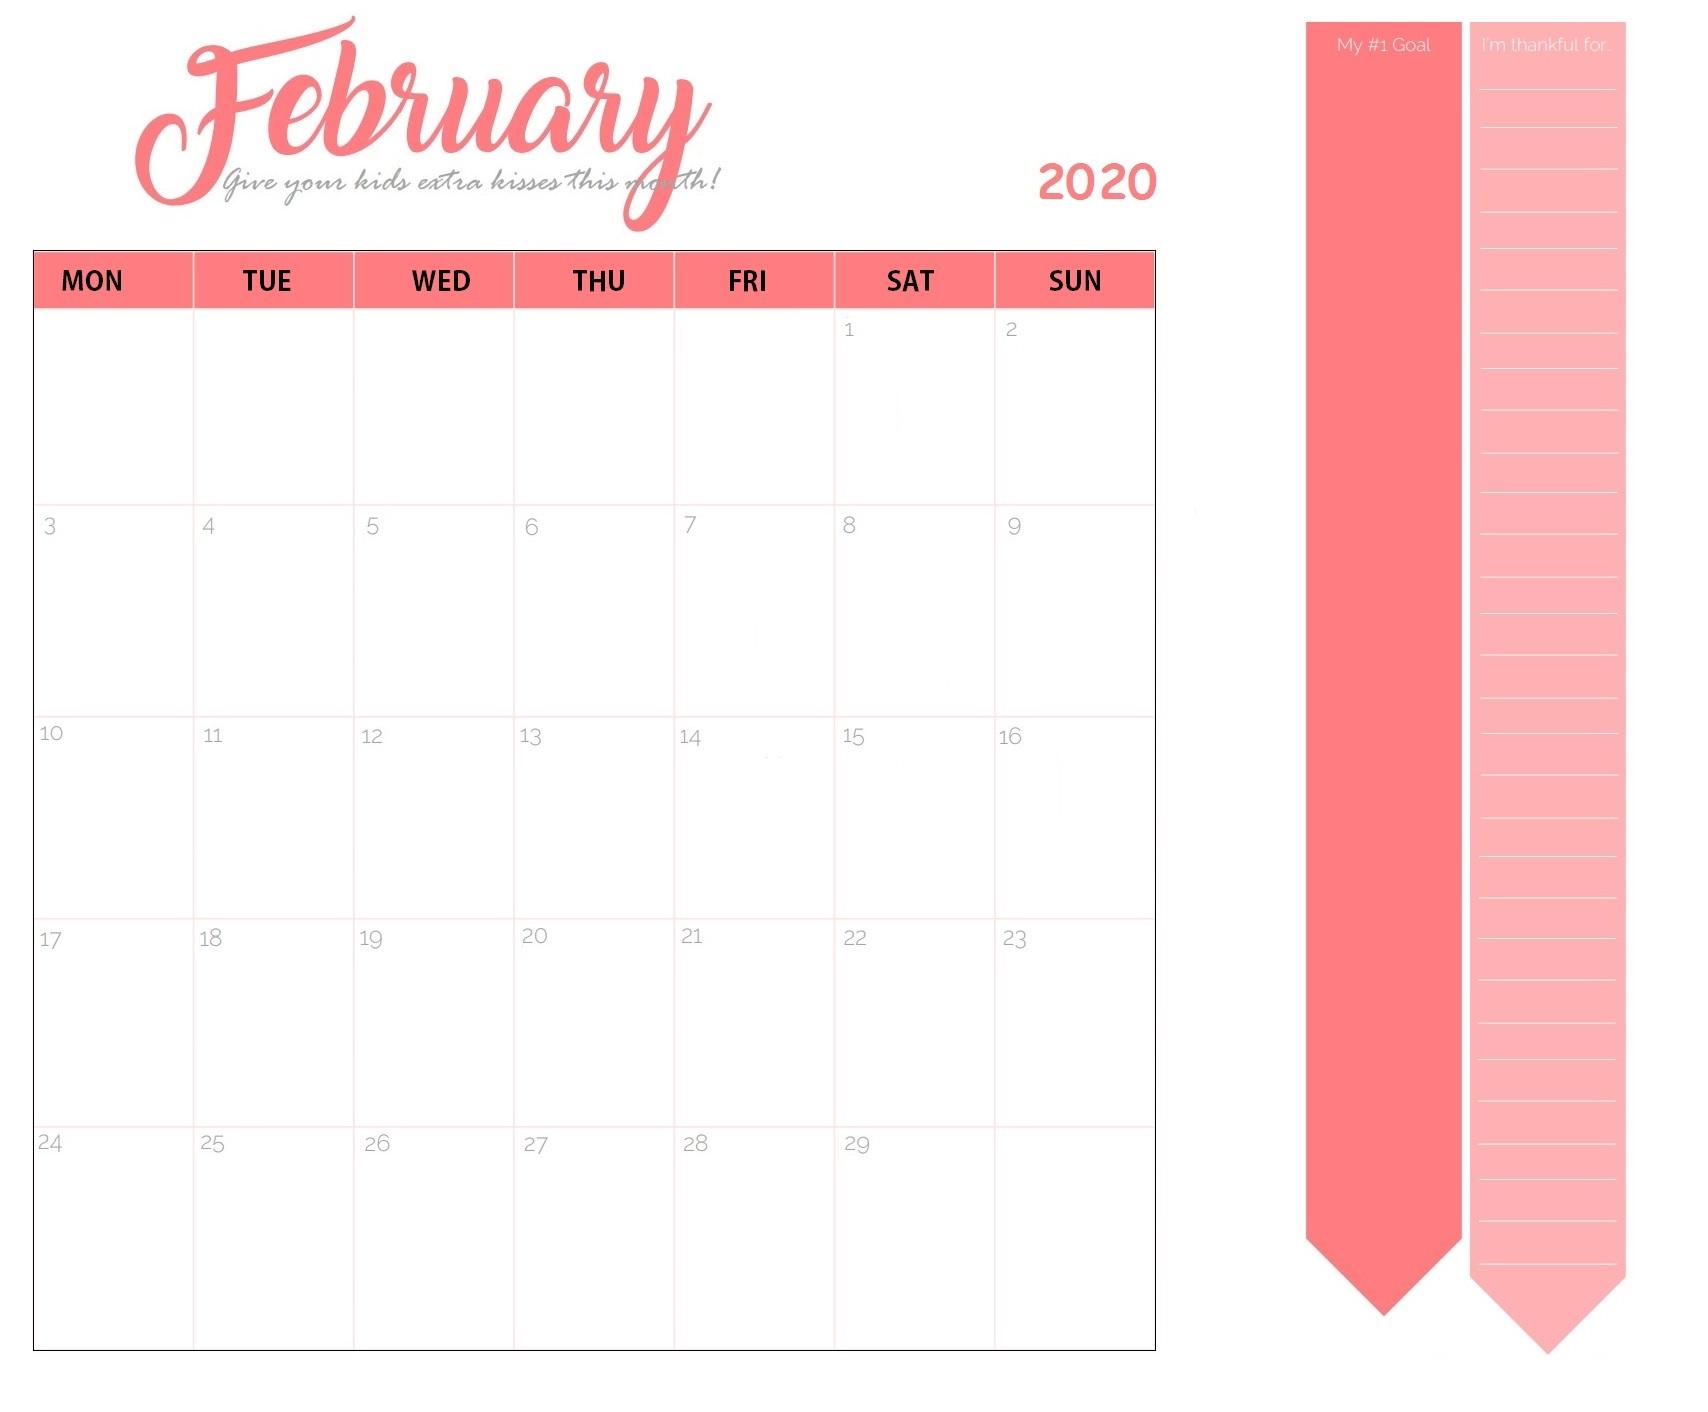 Decorative February 2020 Desk Calendar